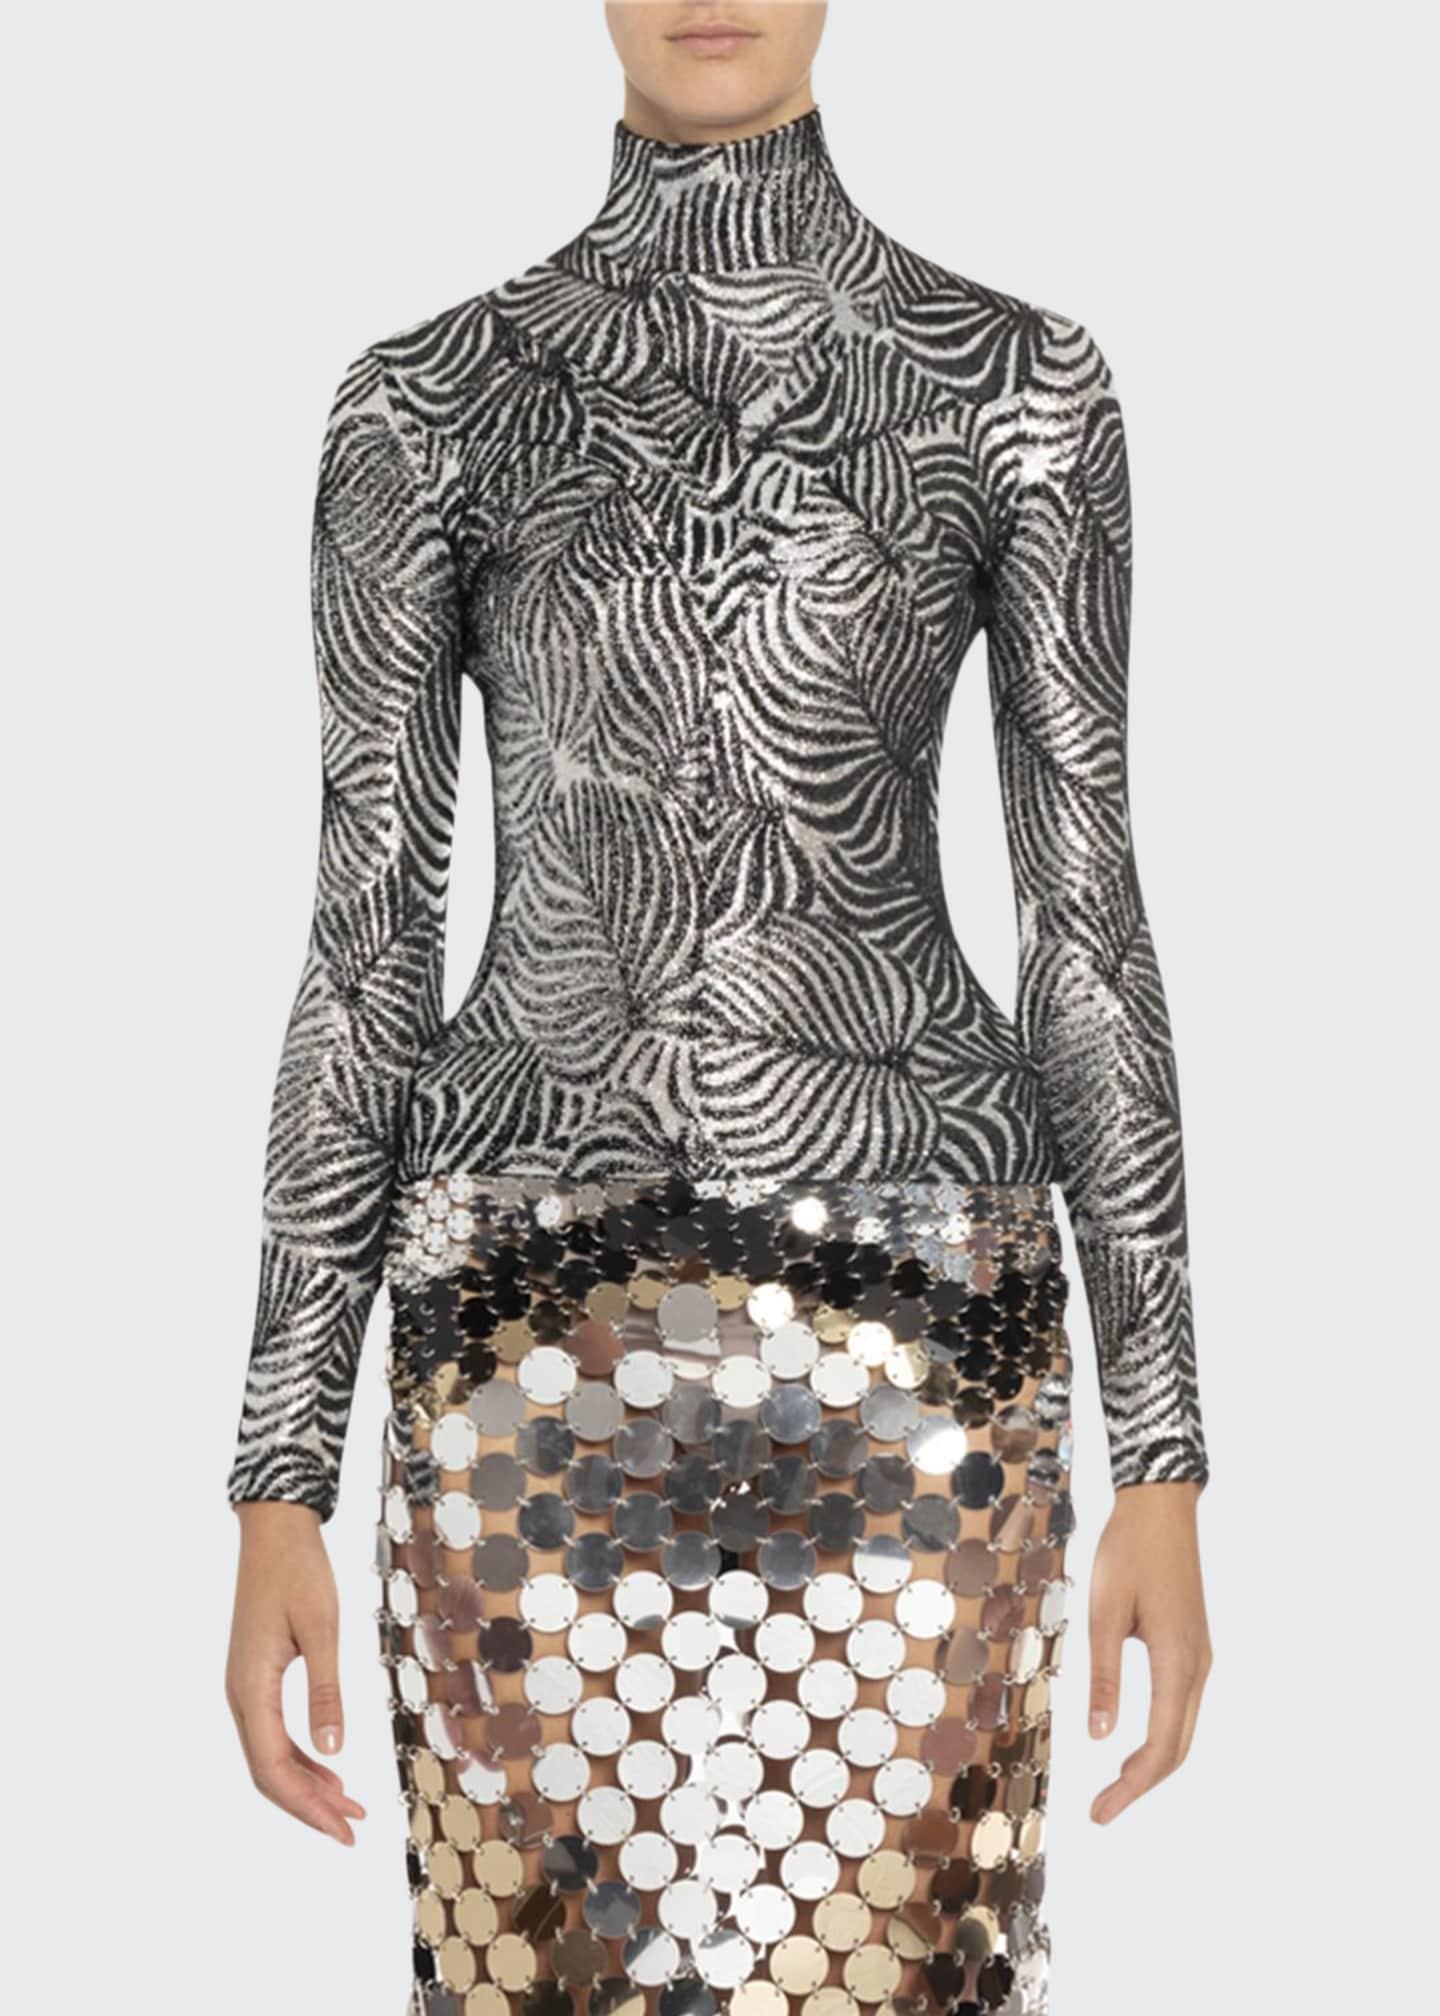 Paco Rabanne Silver Leaf Print Turtleneck Sweater